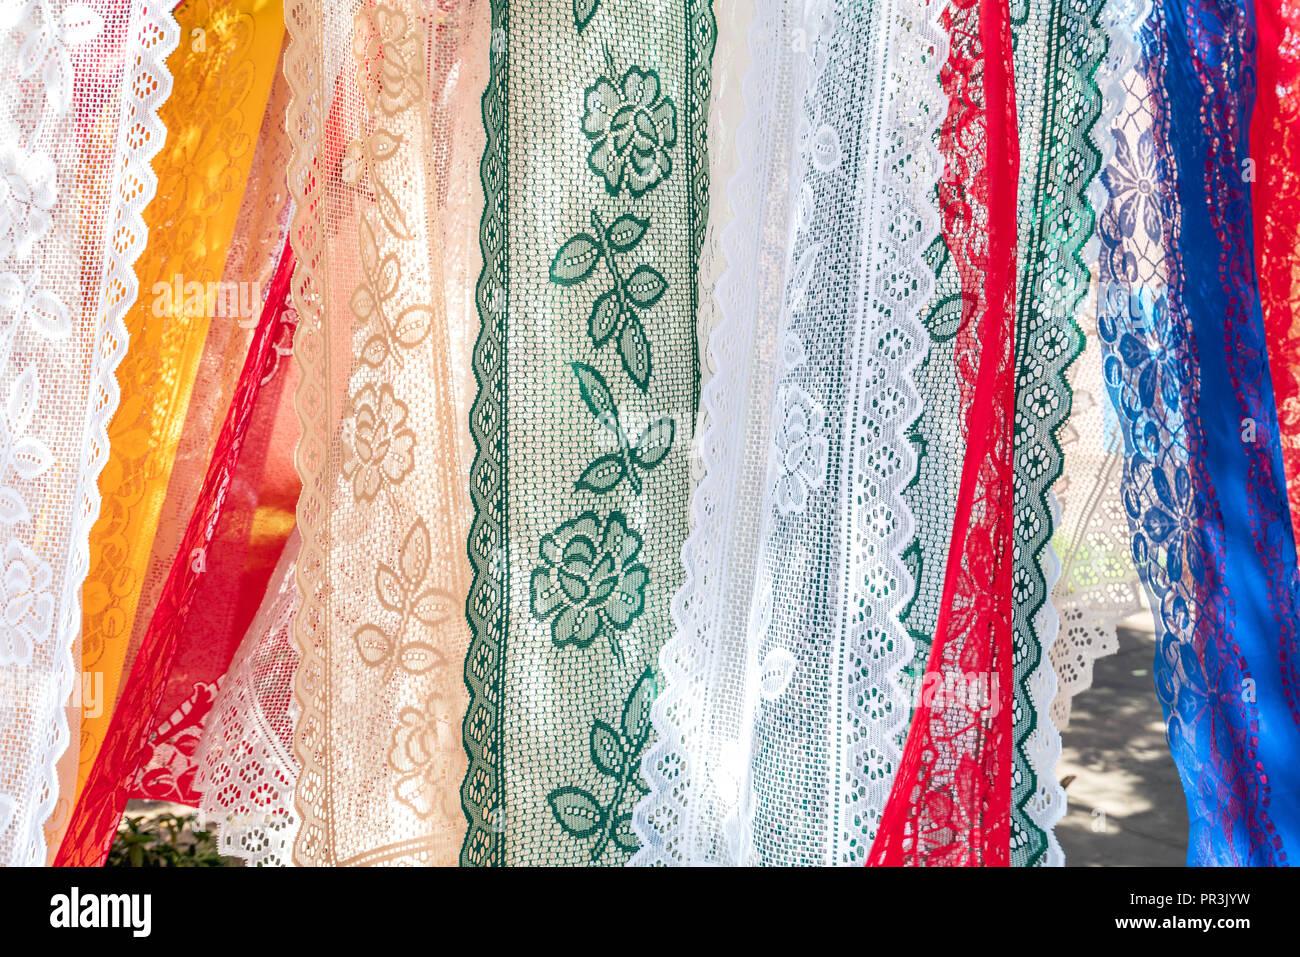 Colorful lace towels in the air, in Olinda, Pernambuco, Brazil - Stock Image